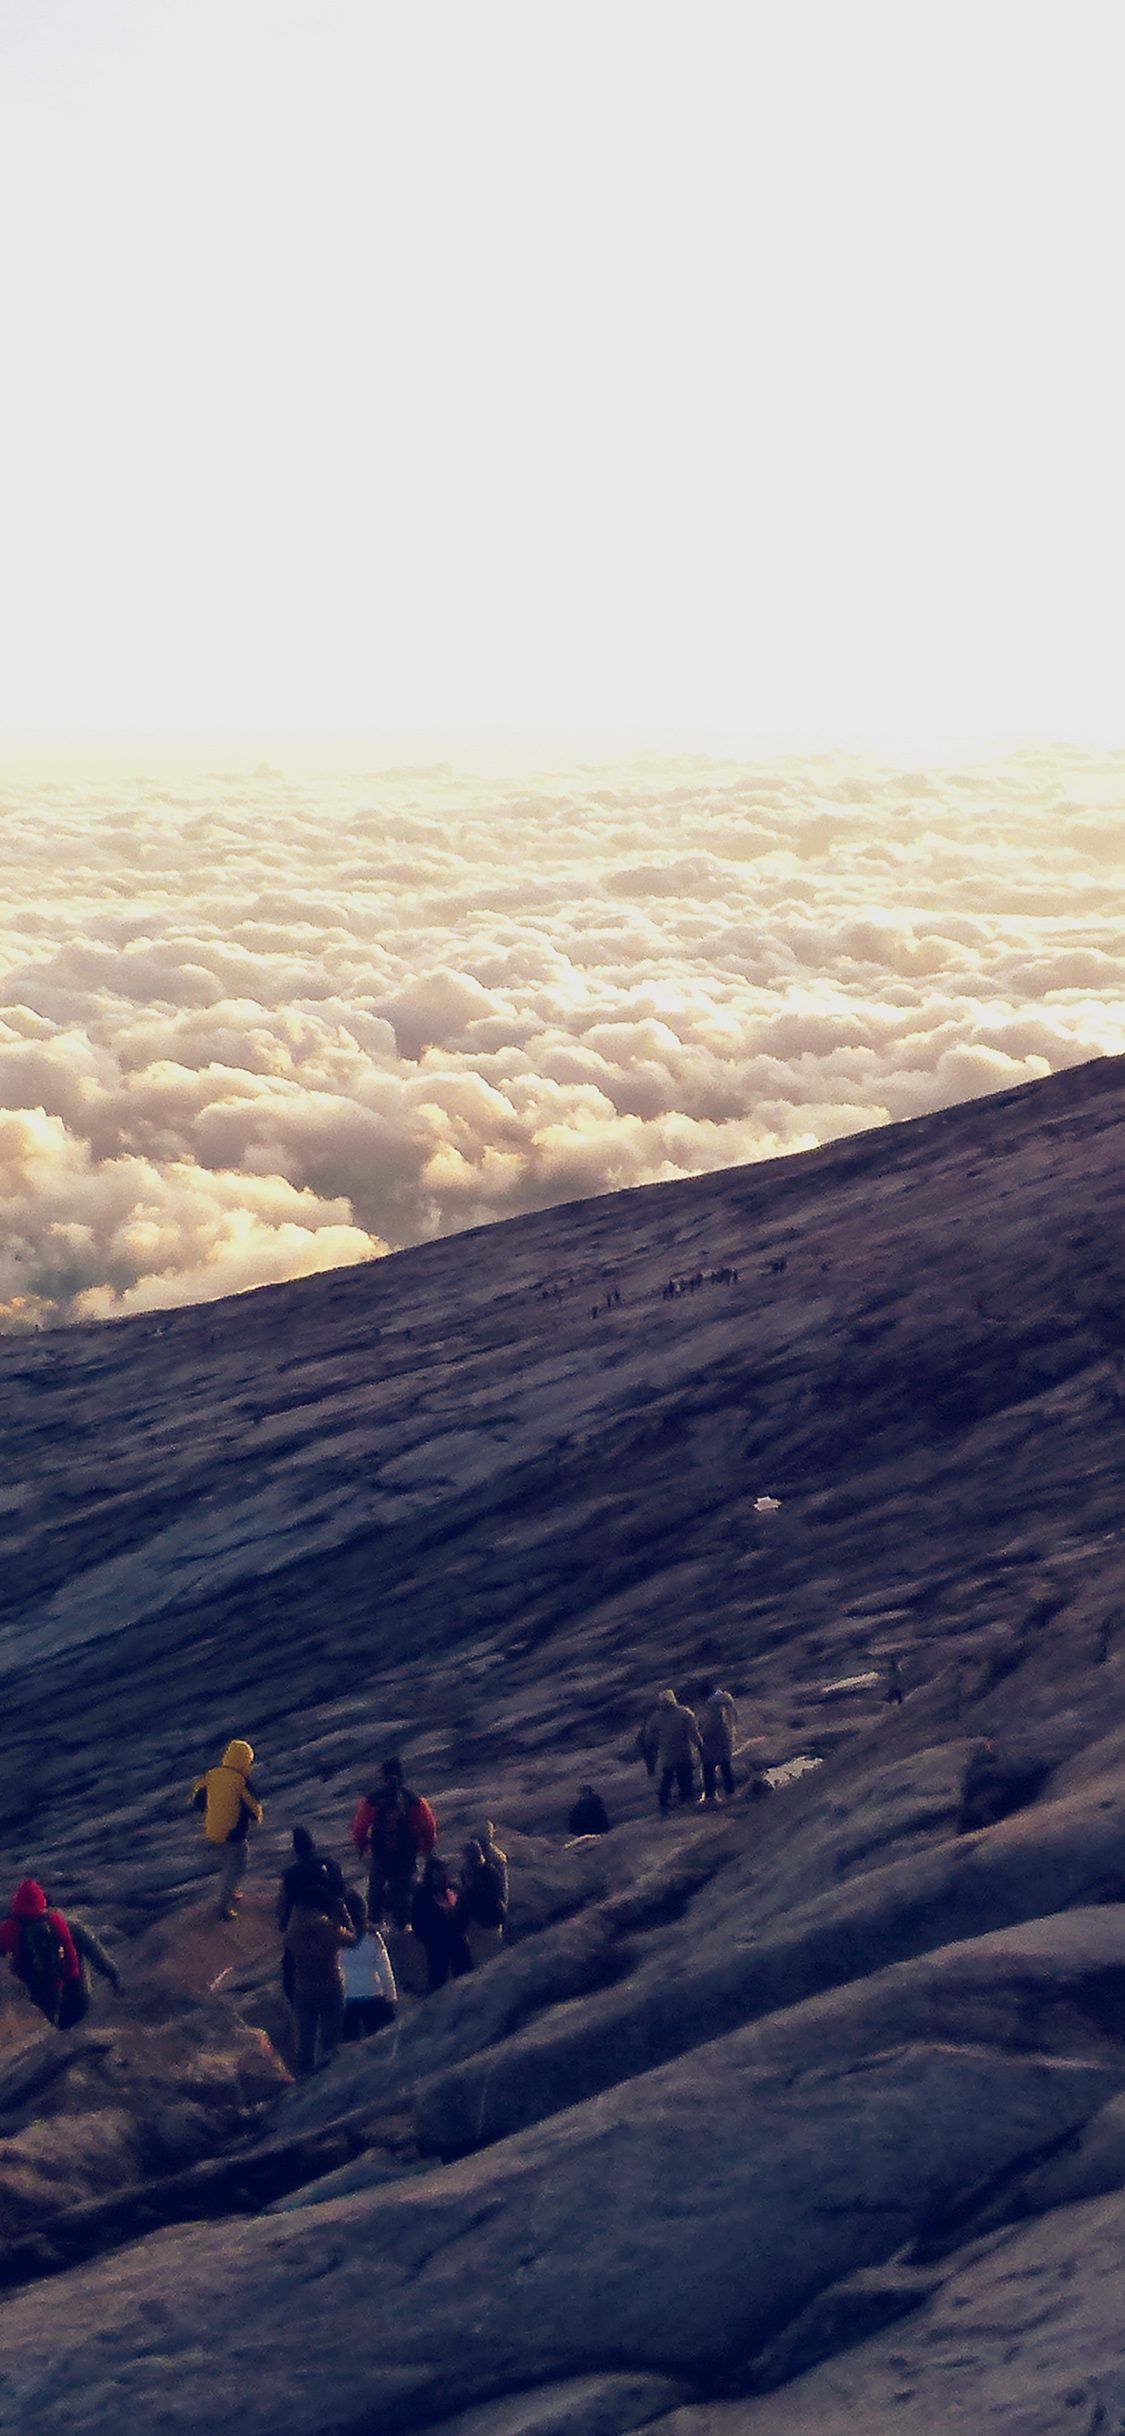 iPhonexpapers.com-Apple-iPhone-wallpaper-mt77-mountain-sky-sunny-day-cloud-climbing-shiny